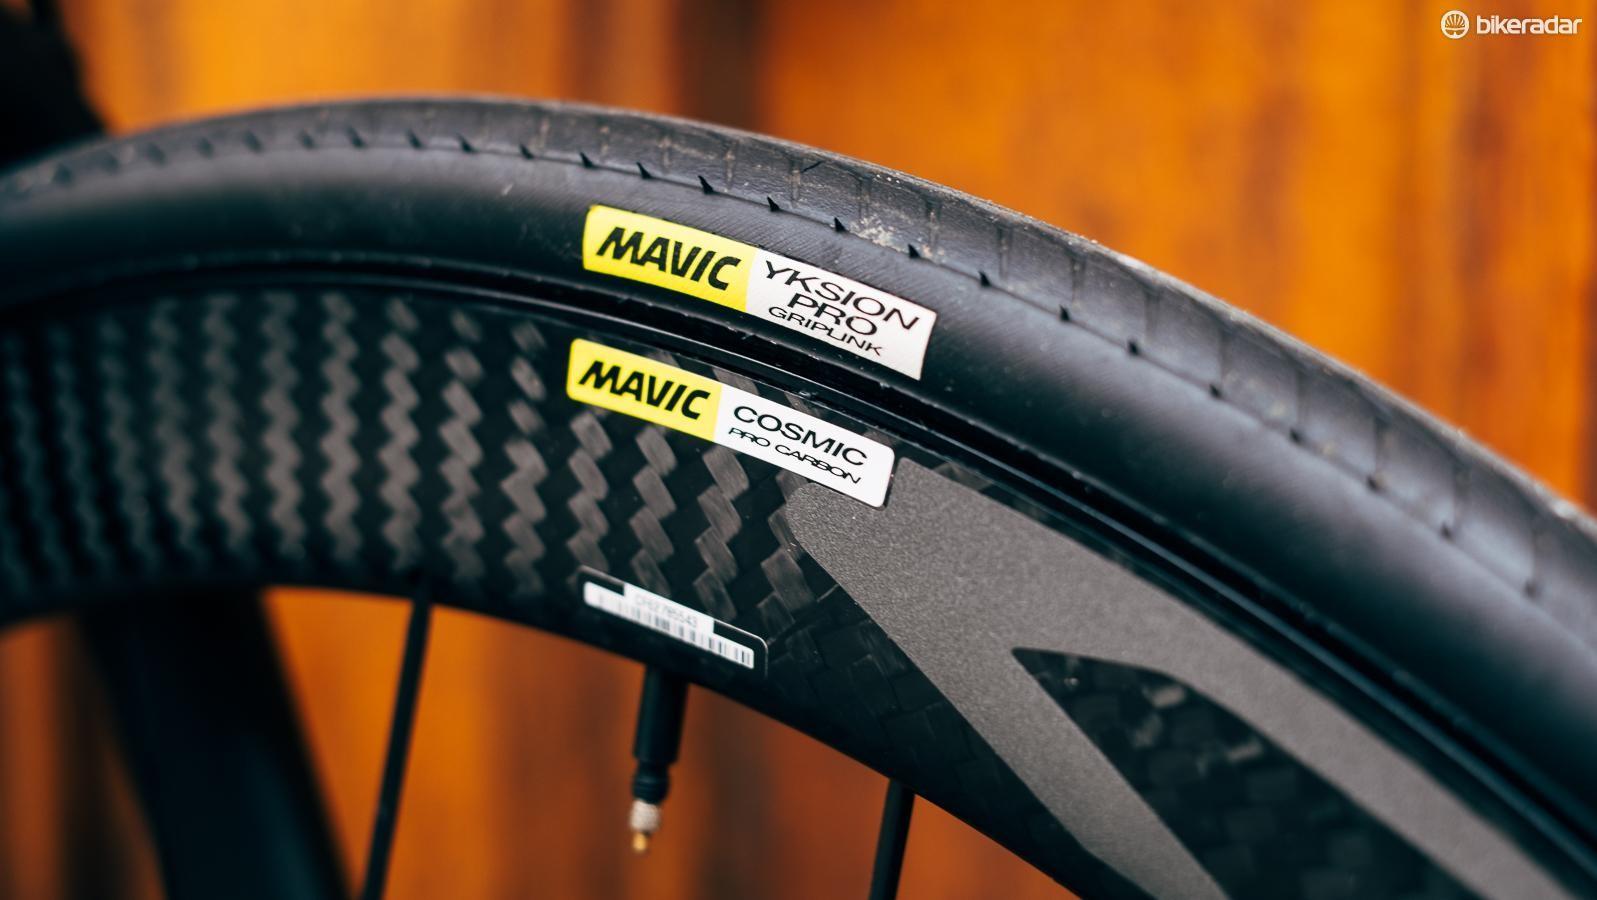 Mavic's new Cosmic Pro Disc wheelset comes shod with Mavic Yksion Pro 25mm clinchers